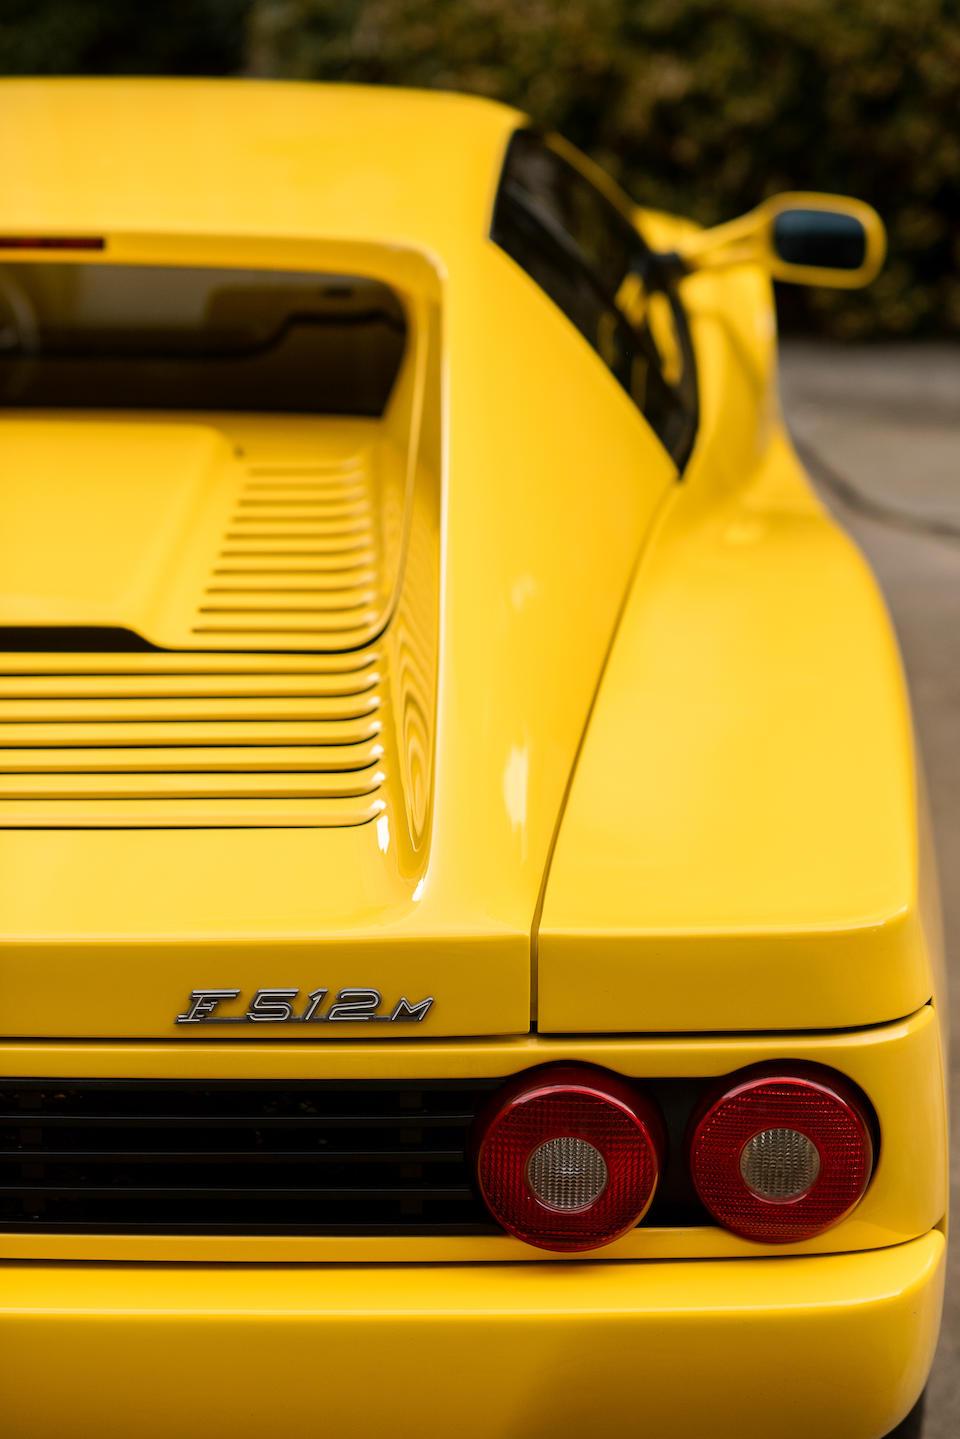 <b>1995 Ferrari F512 M</b>M<br />VIN. ZFFVG40A2S0100154<br />Engine no. 161524